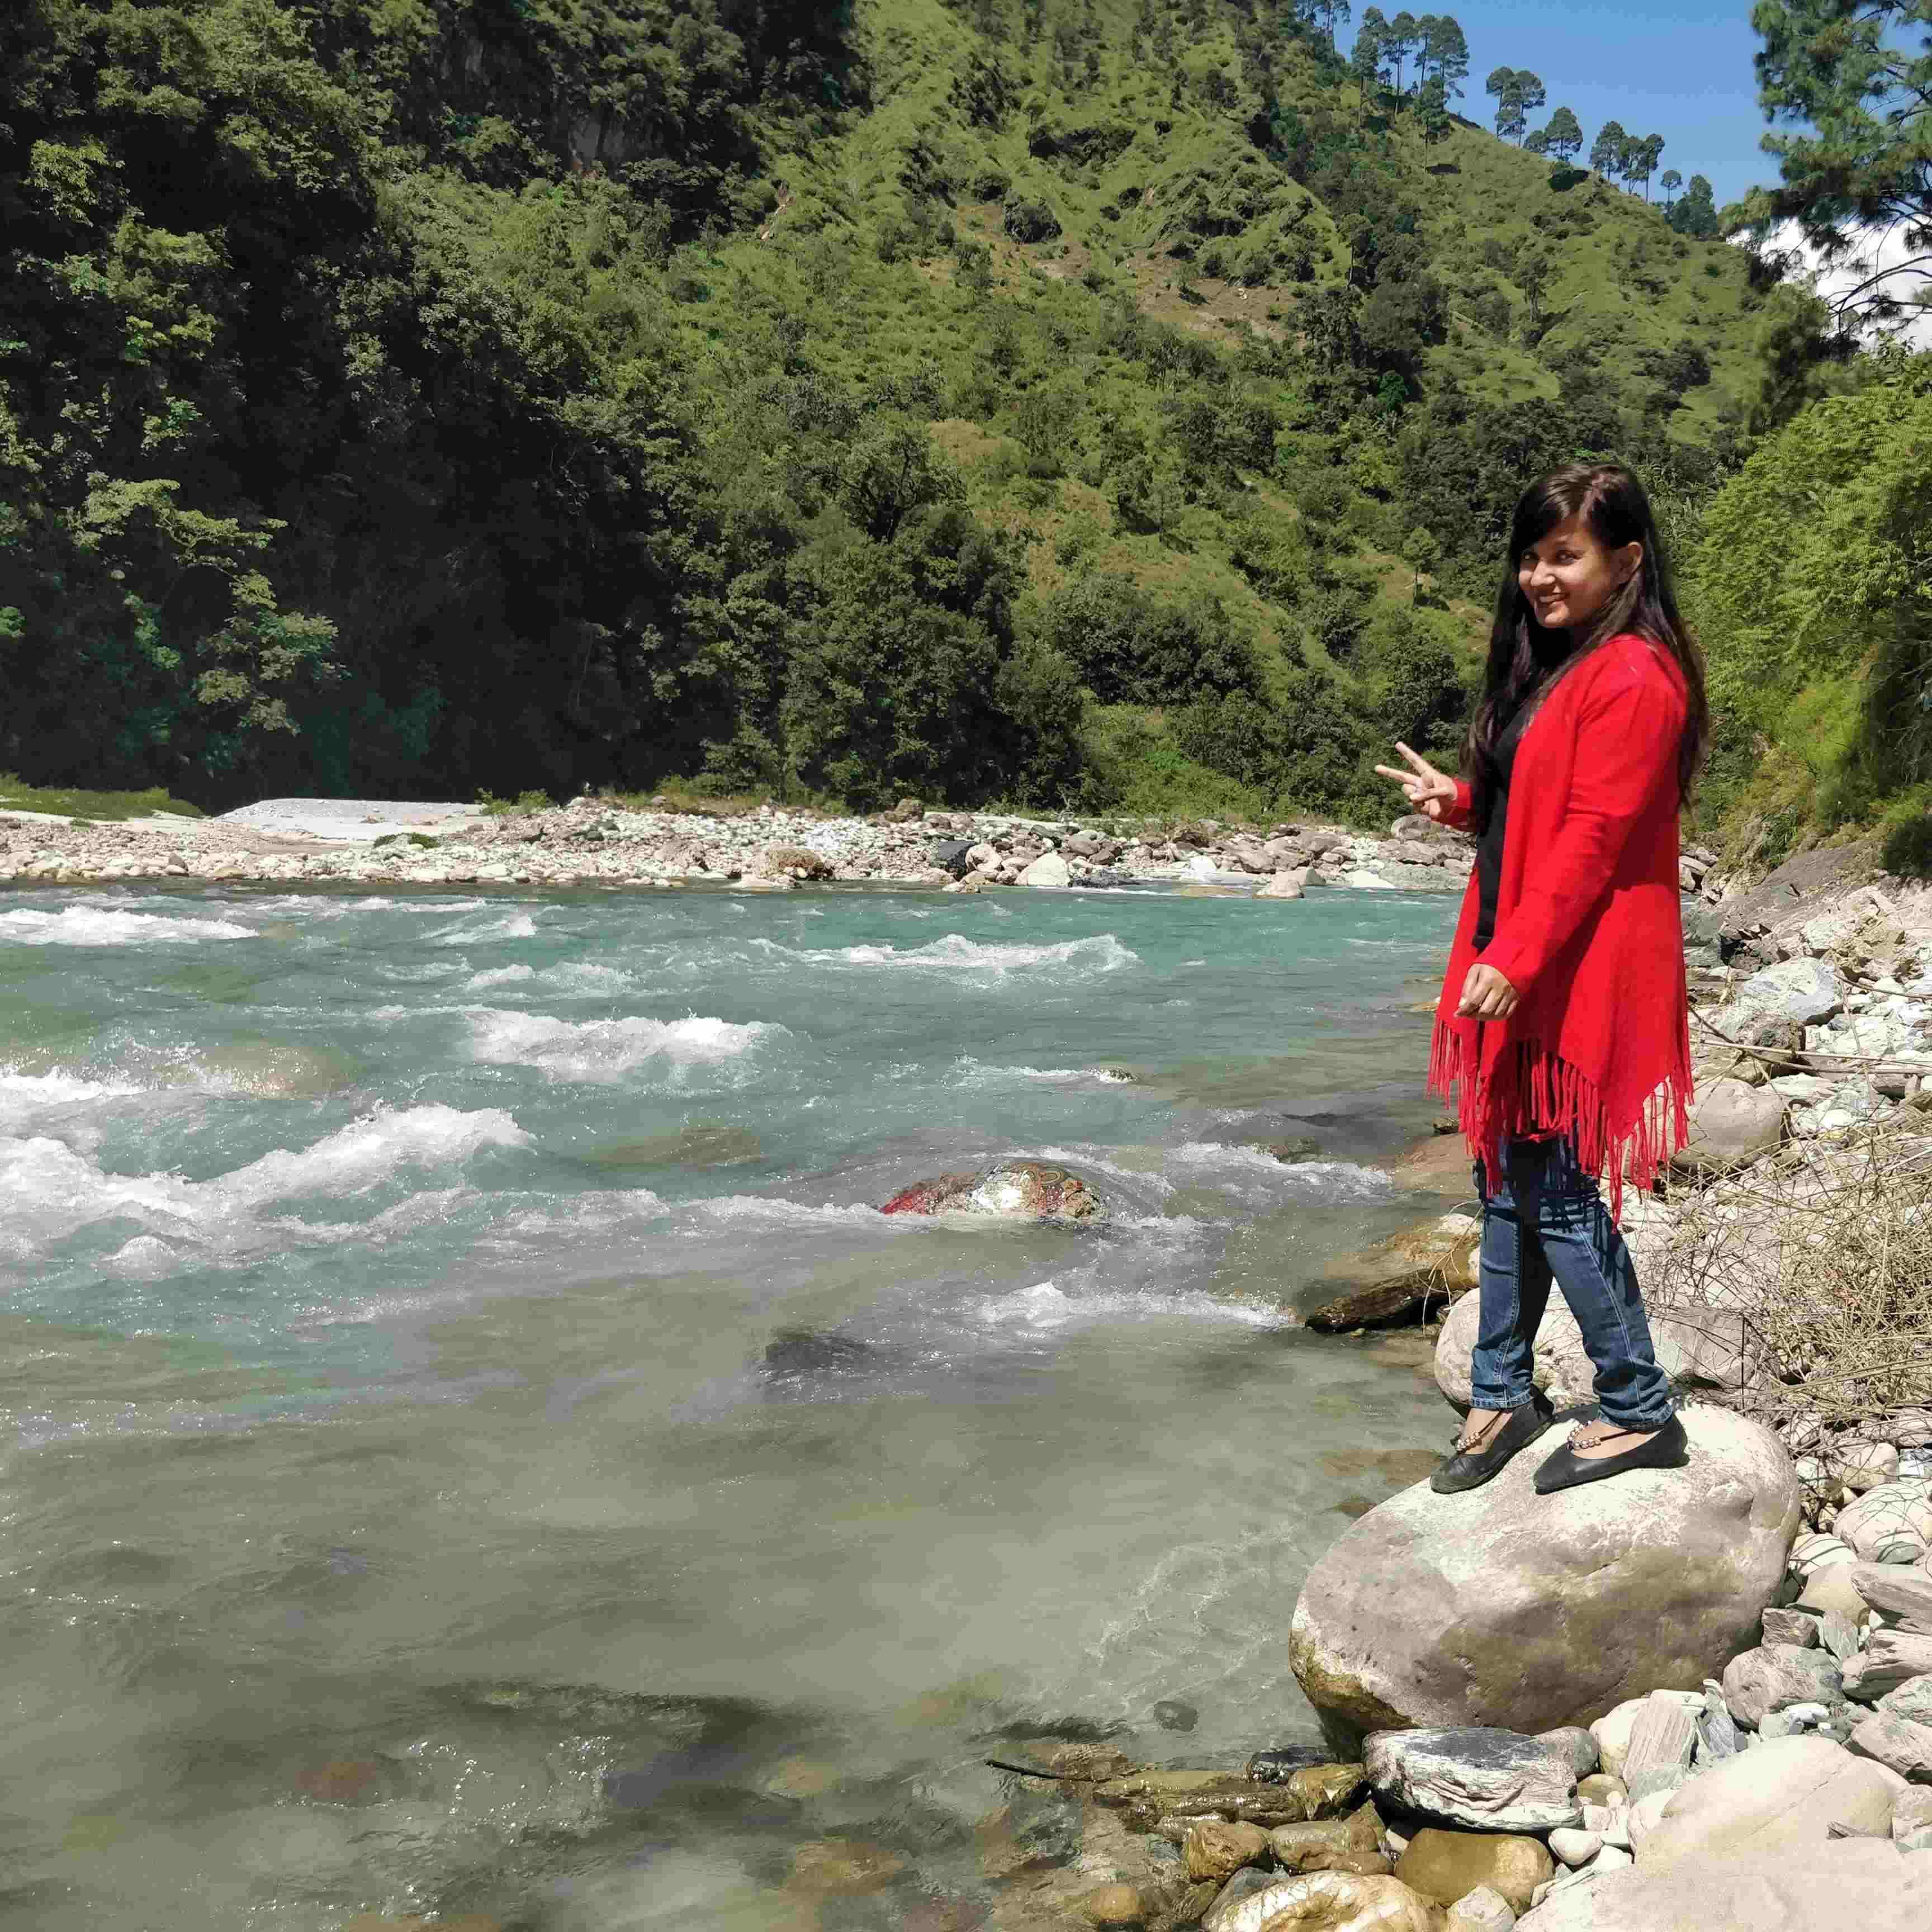 Shreeya Dhapola नज्मों से इश्क़ करती एक पहाड़ी लड़की 😍 If you are copying my content than Please give due credits